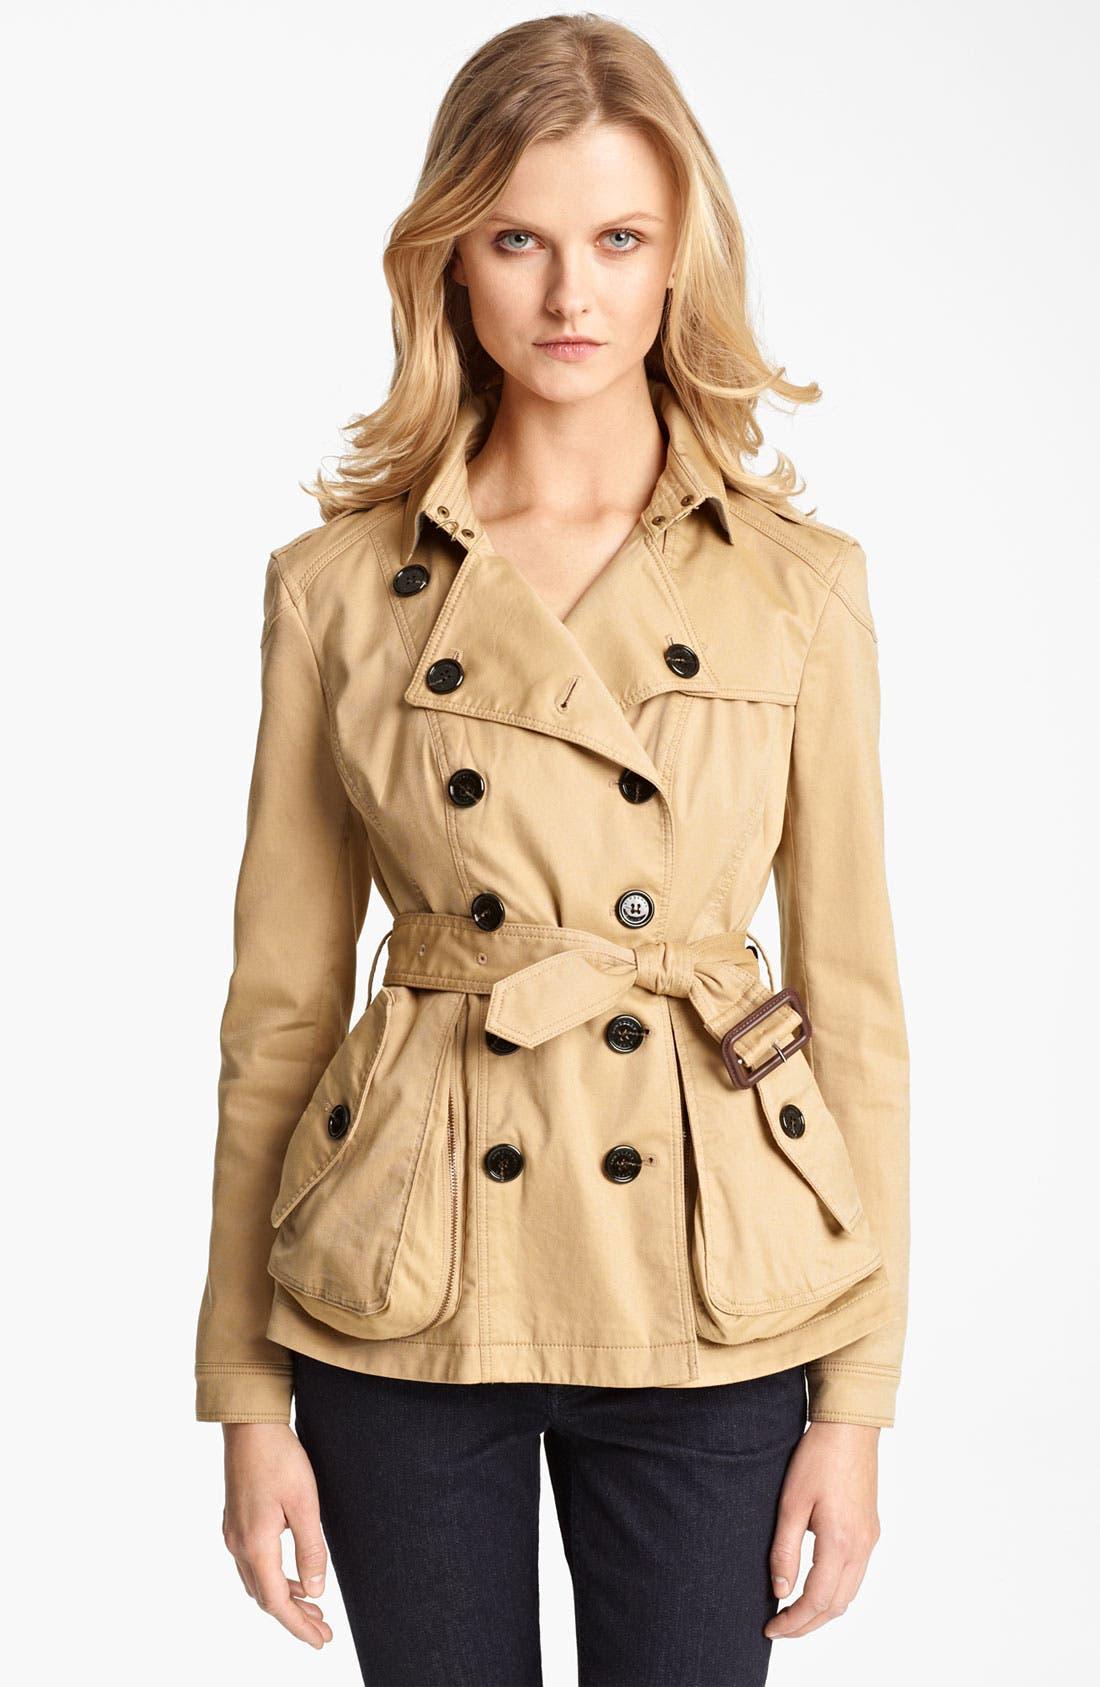 Alternate Image 1 Selected - Burberry Brit 'Reedham' Jacket